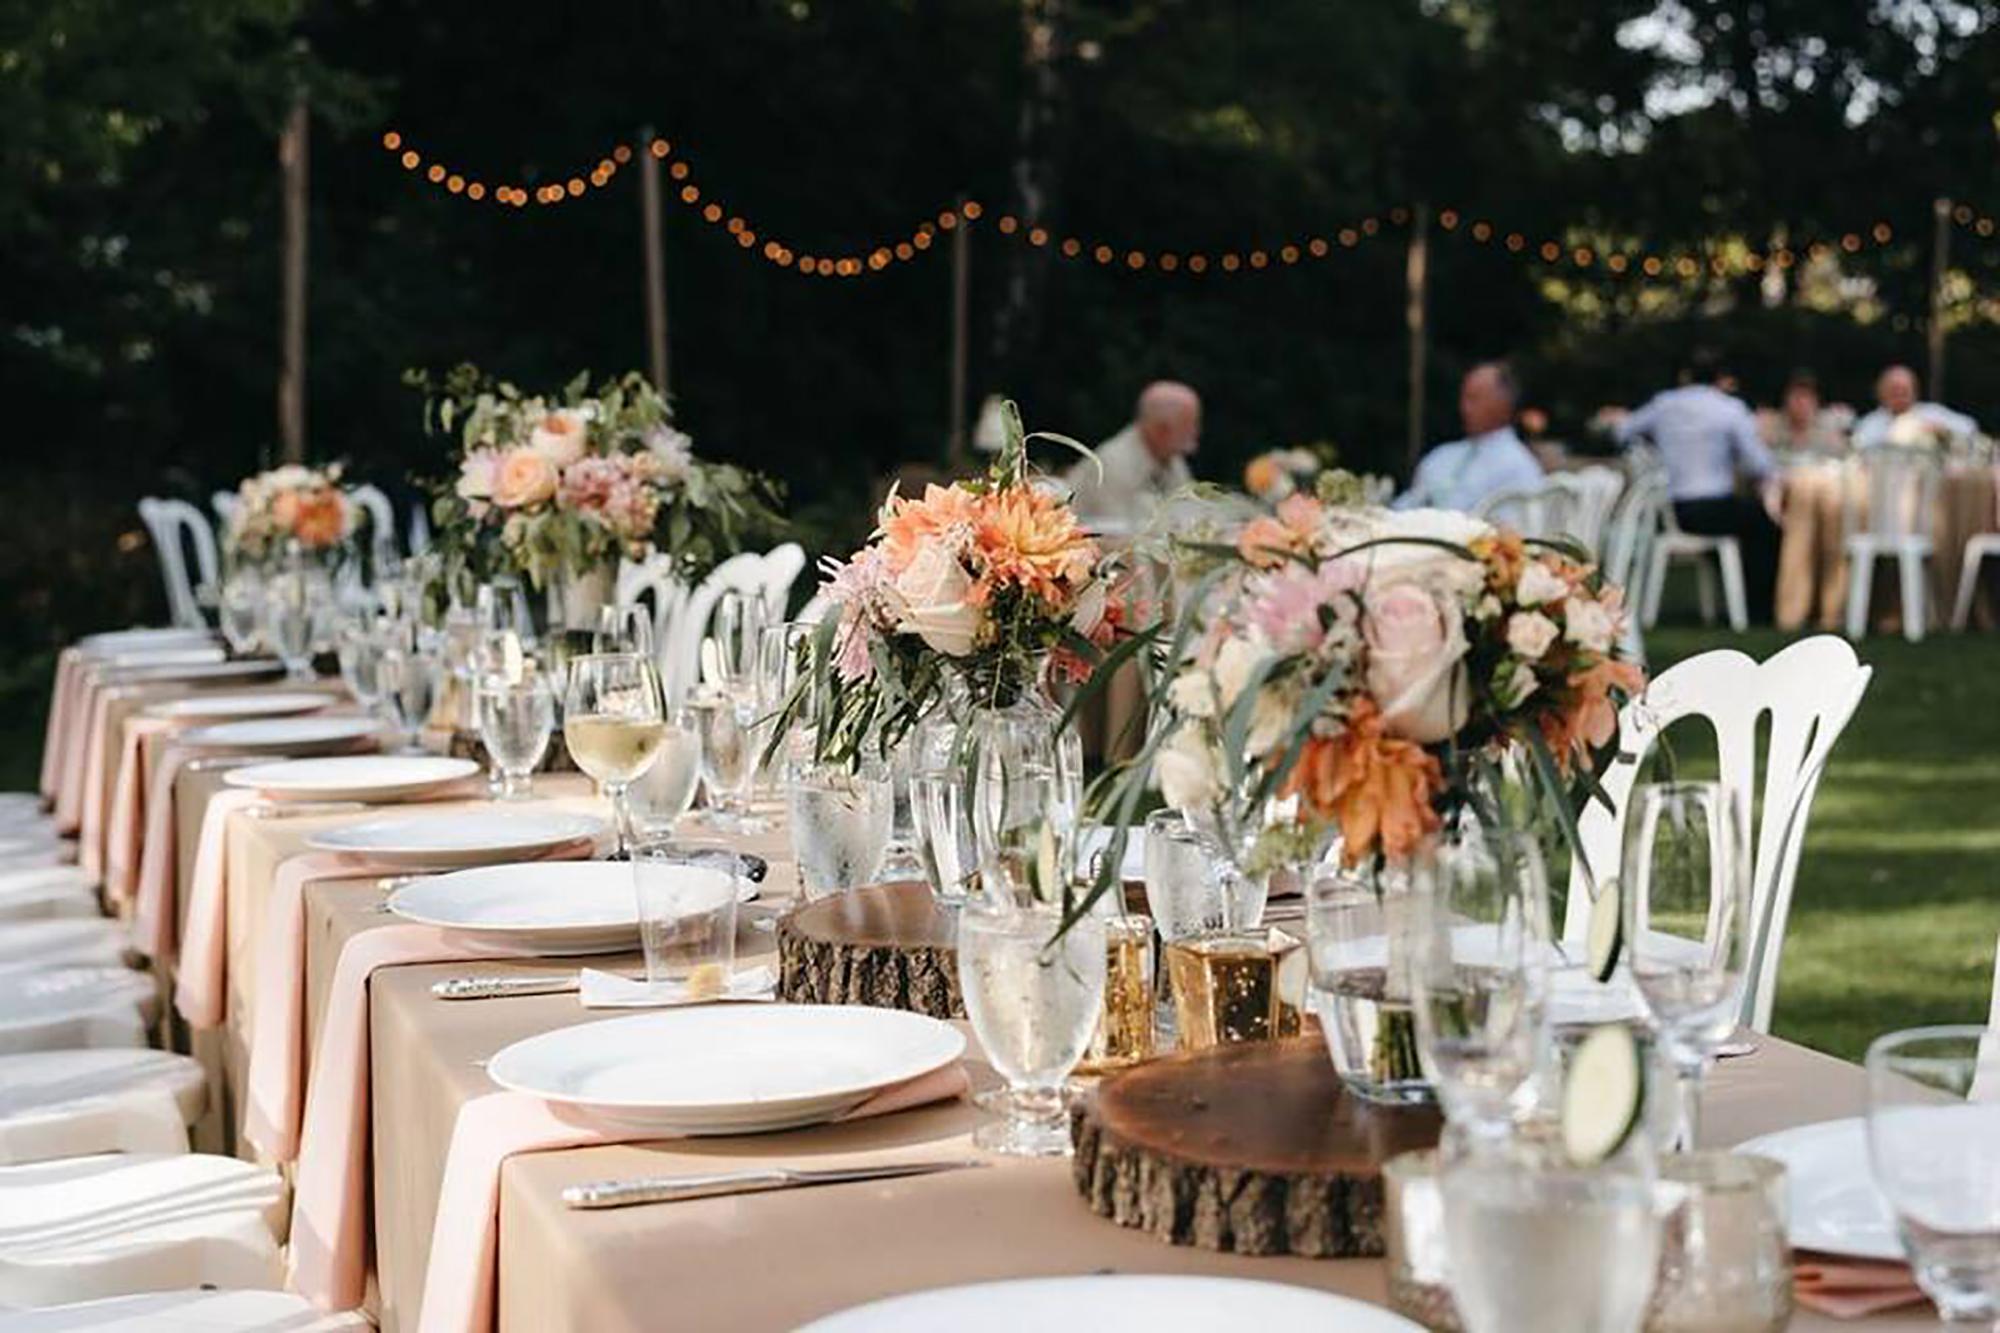 Photo courtesy of Bryan Aulick, Portland Wedding Photographer